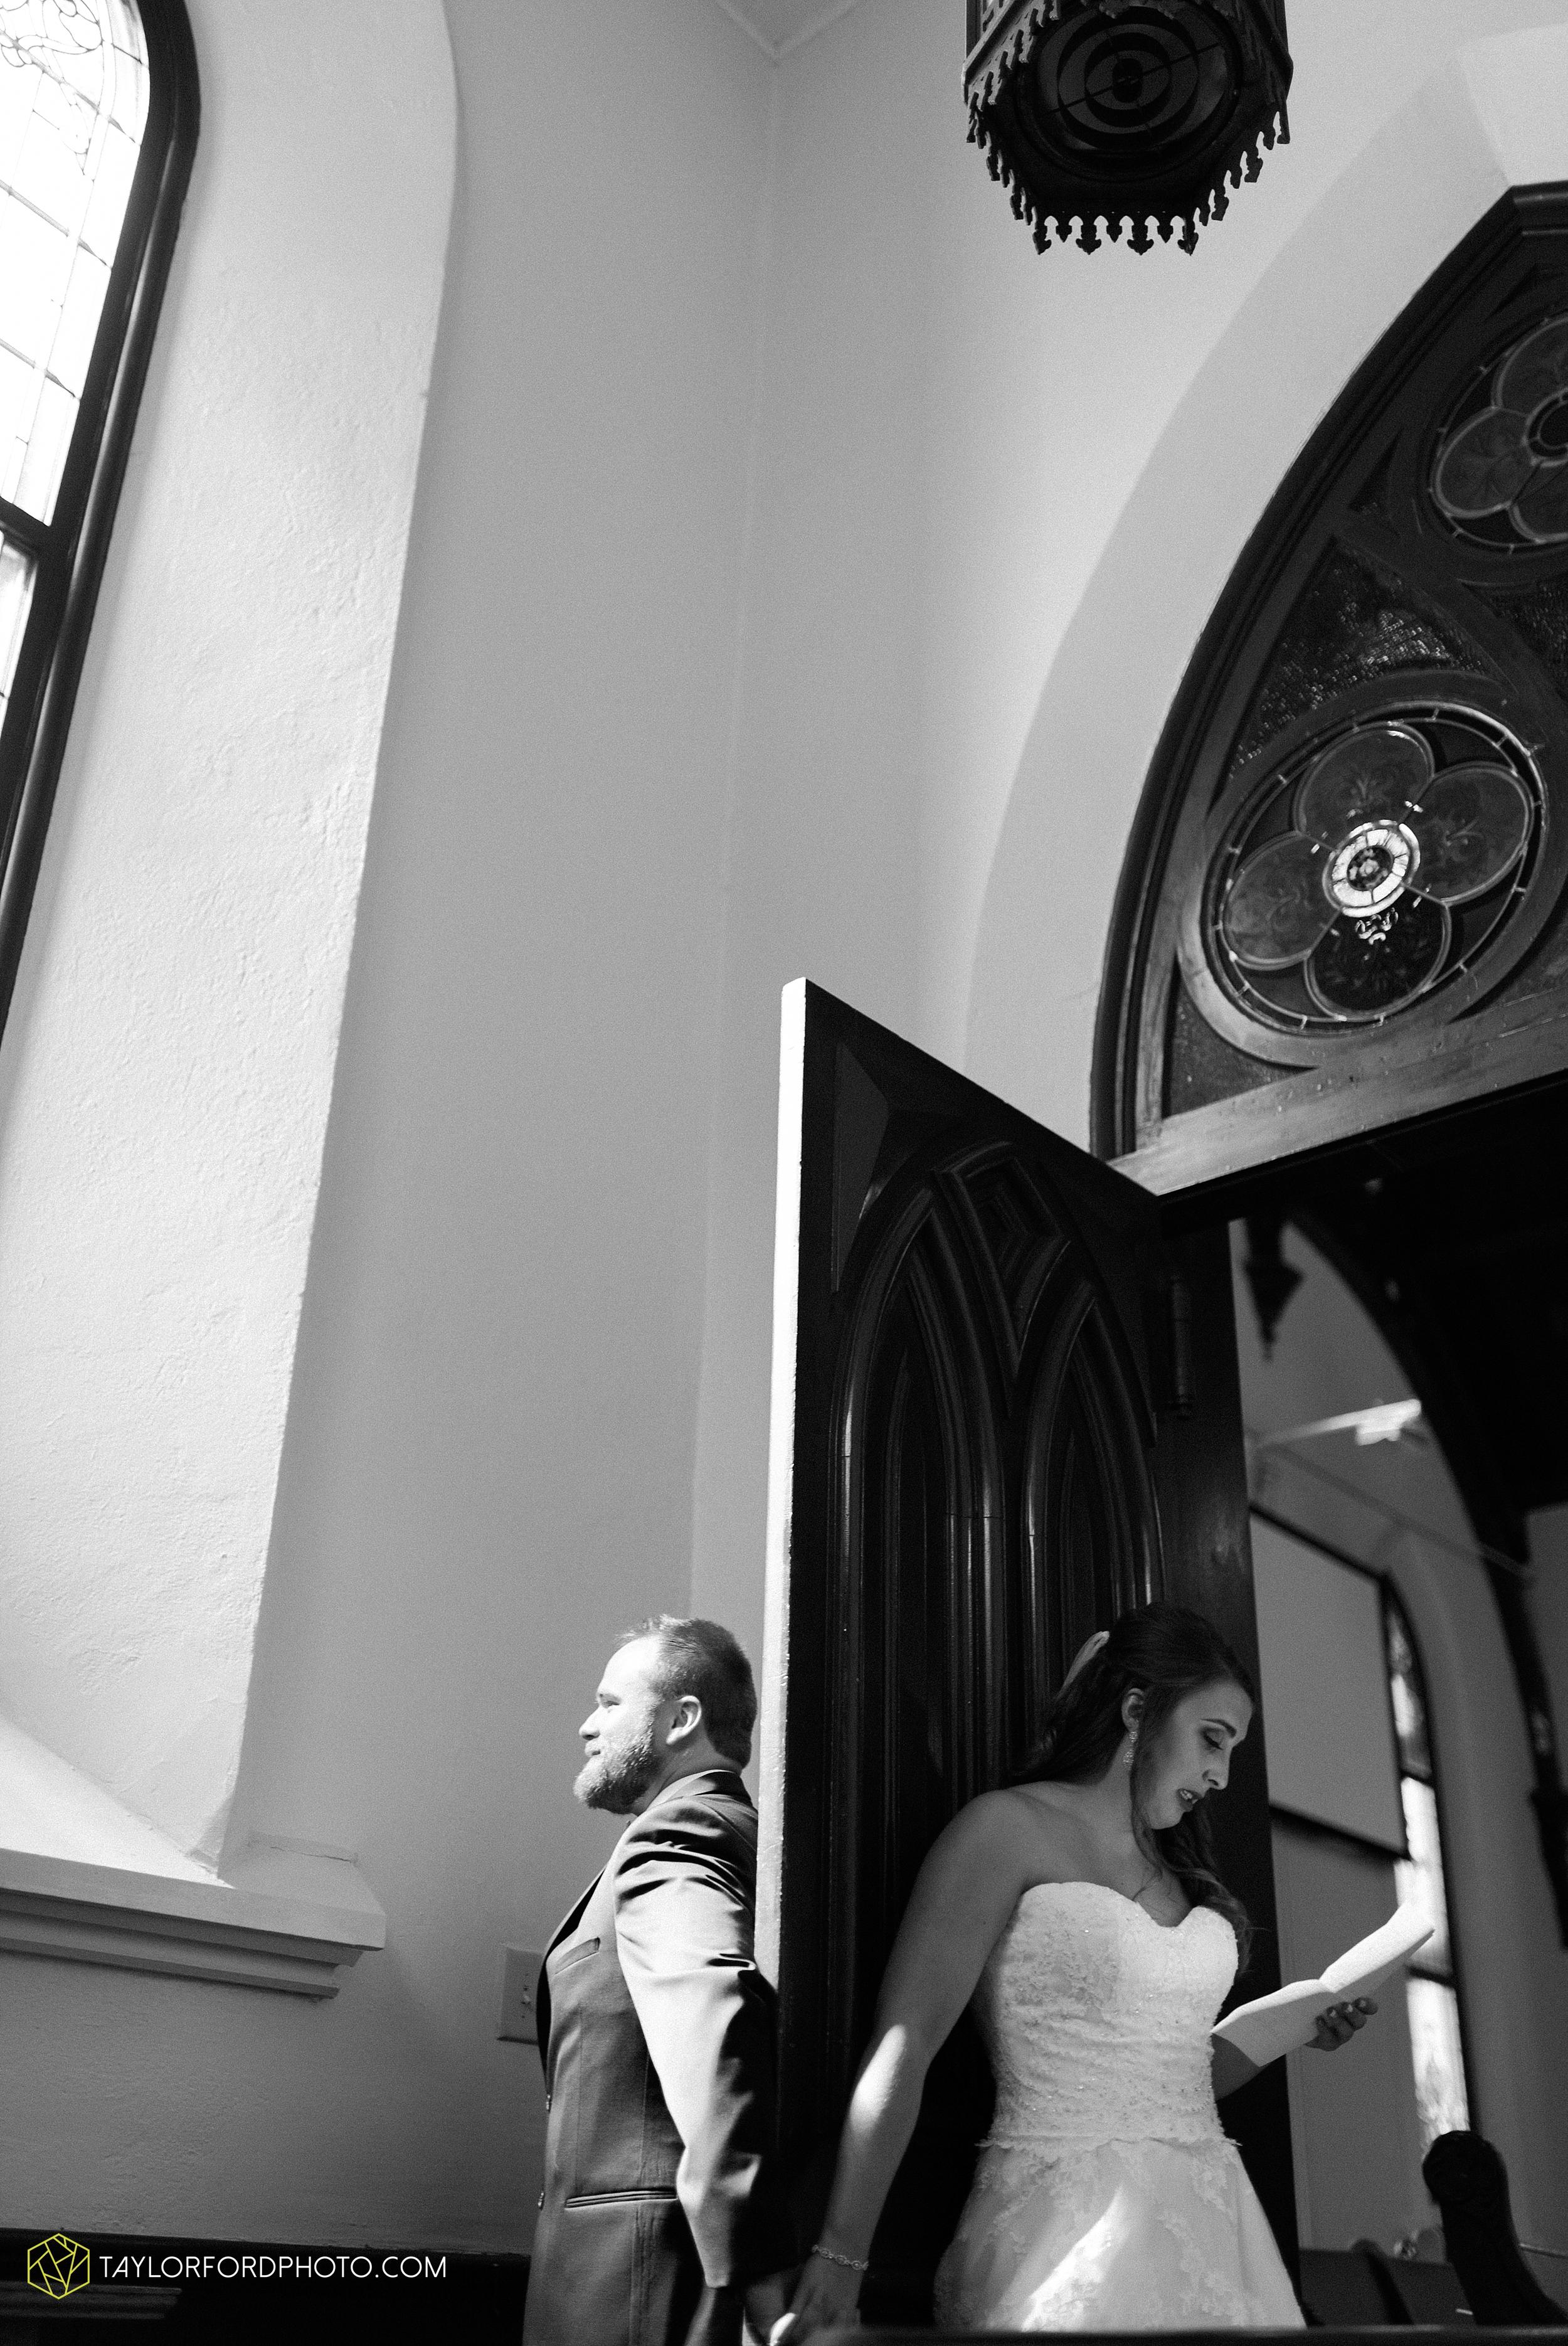 chelsey-zosh-jackson-young-first-united-methodist-church-senior-center-van-wert-ohio-wedding-photographer-taylor-ford-photography_0061.jpg